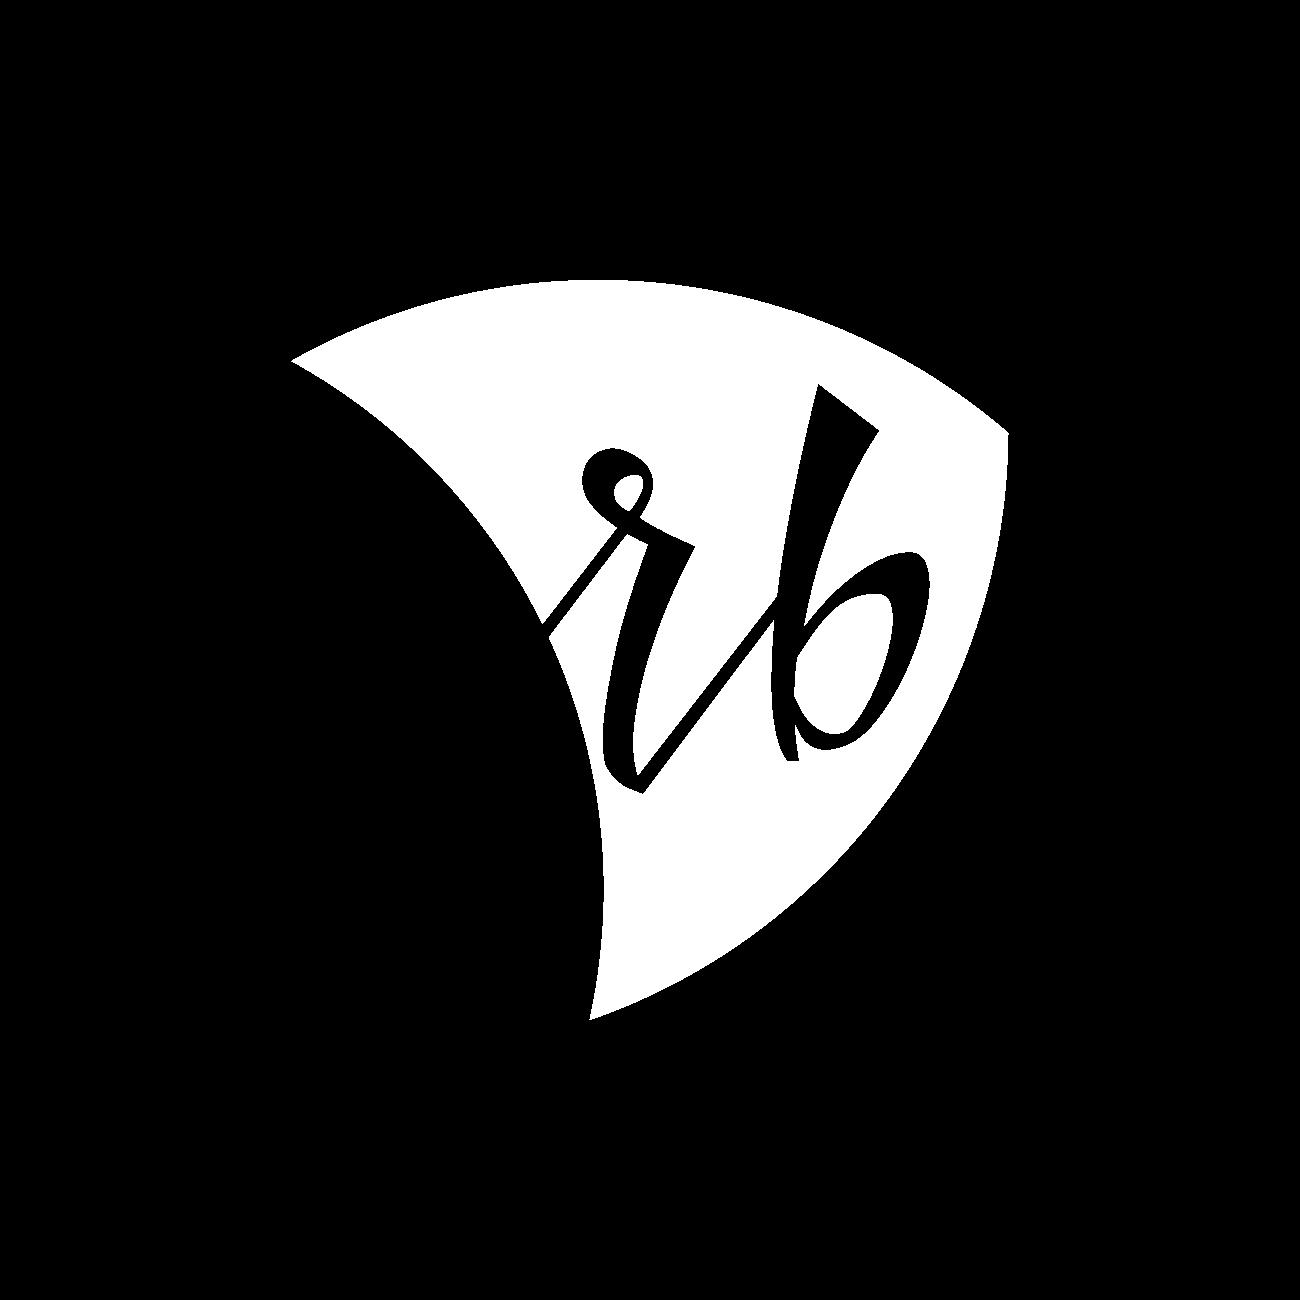 RB Kantoris - logotips uz tumša fona